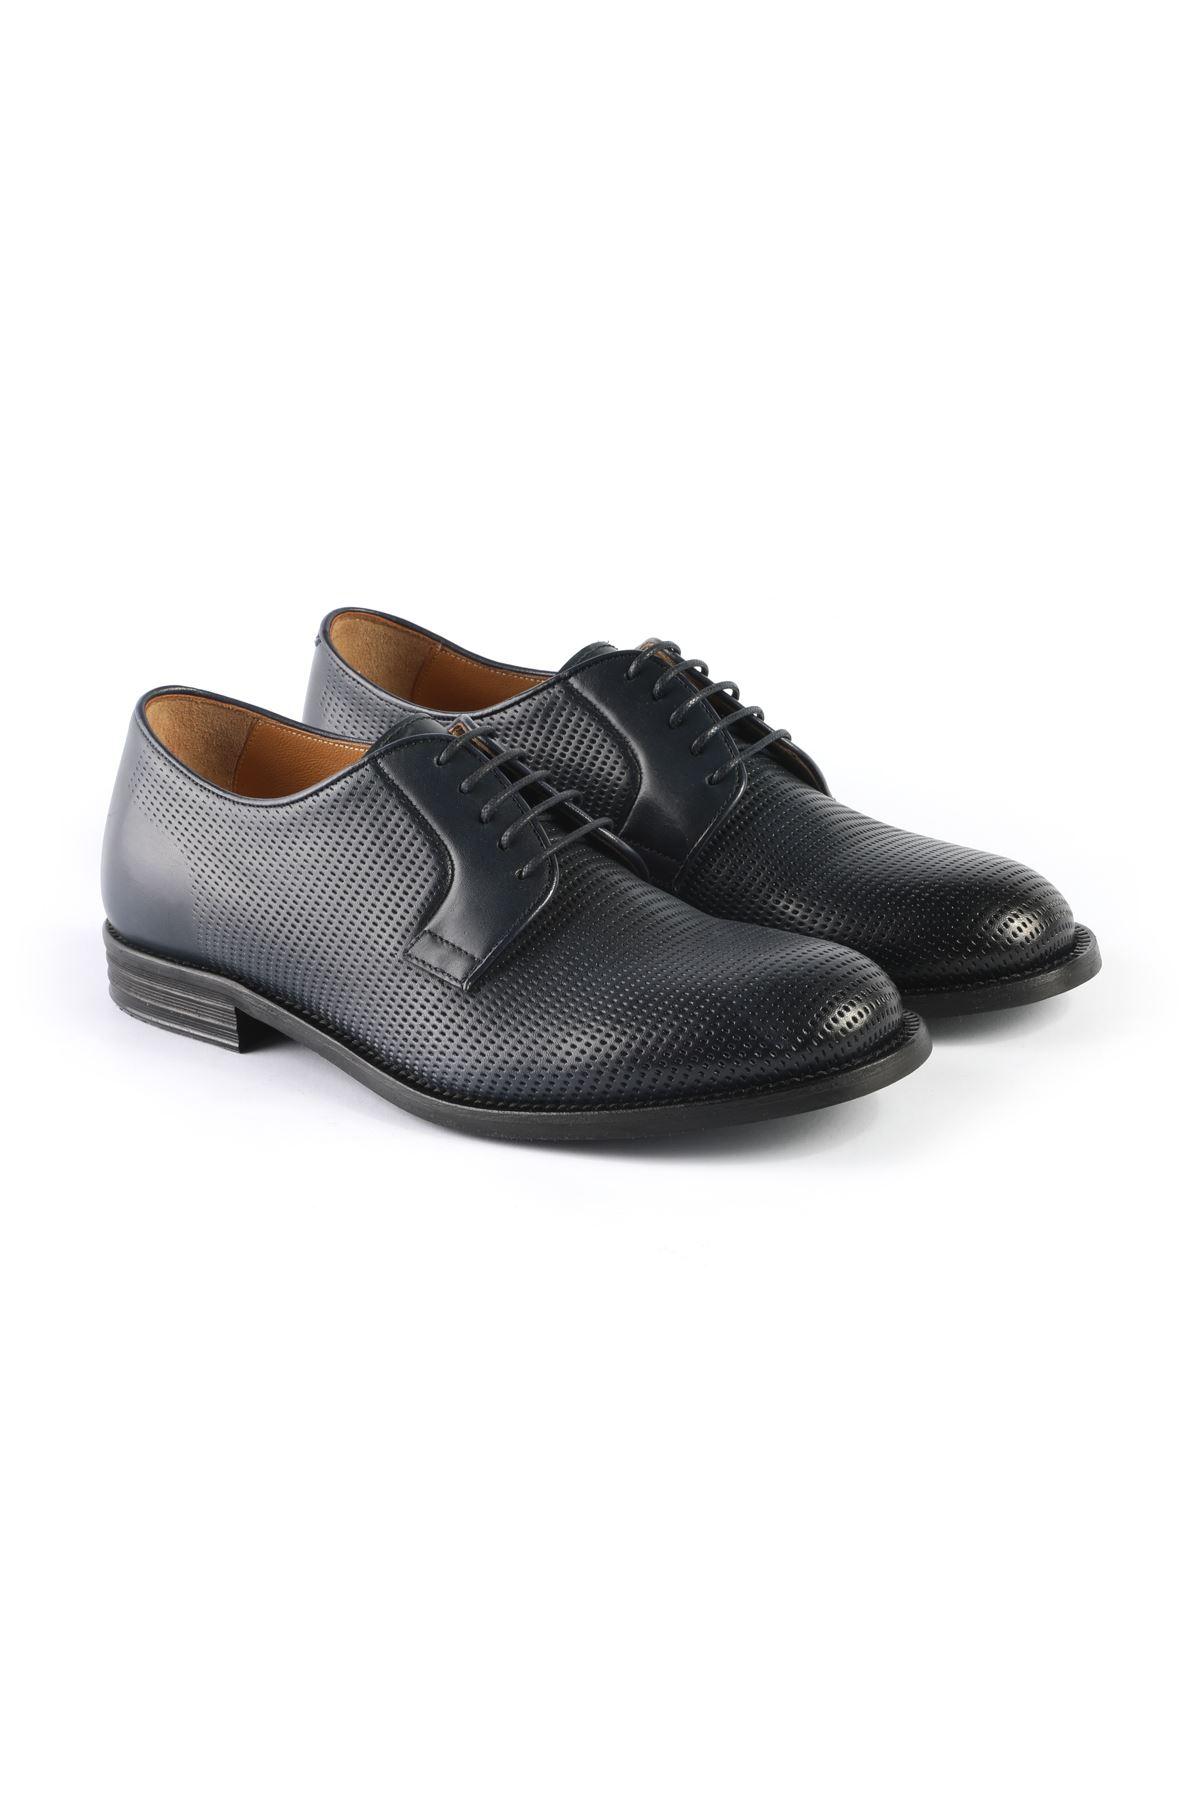 Libero L3210 Lacivert Klasik Ayakkabı